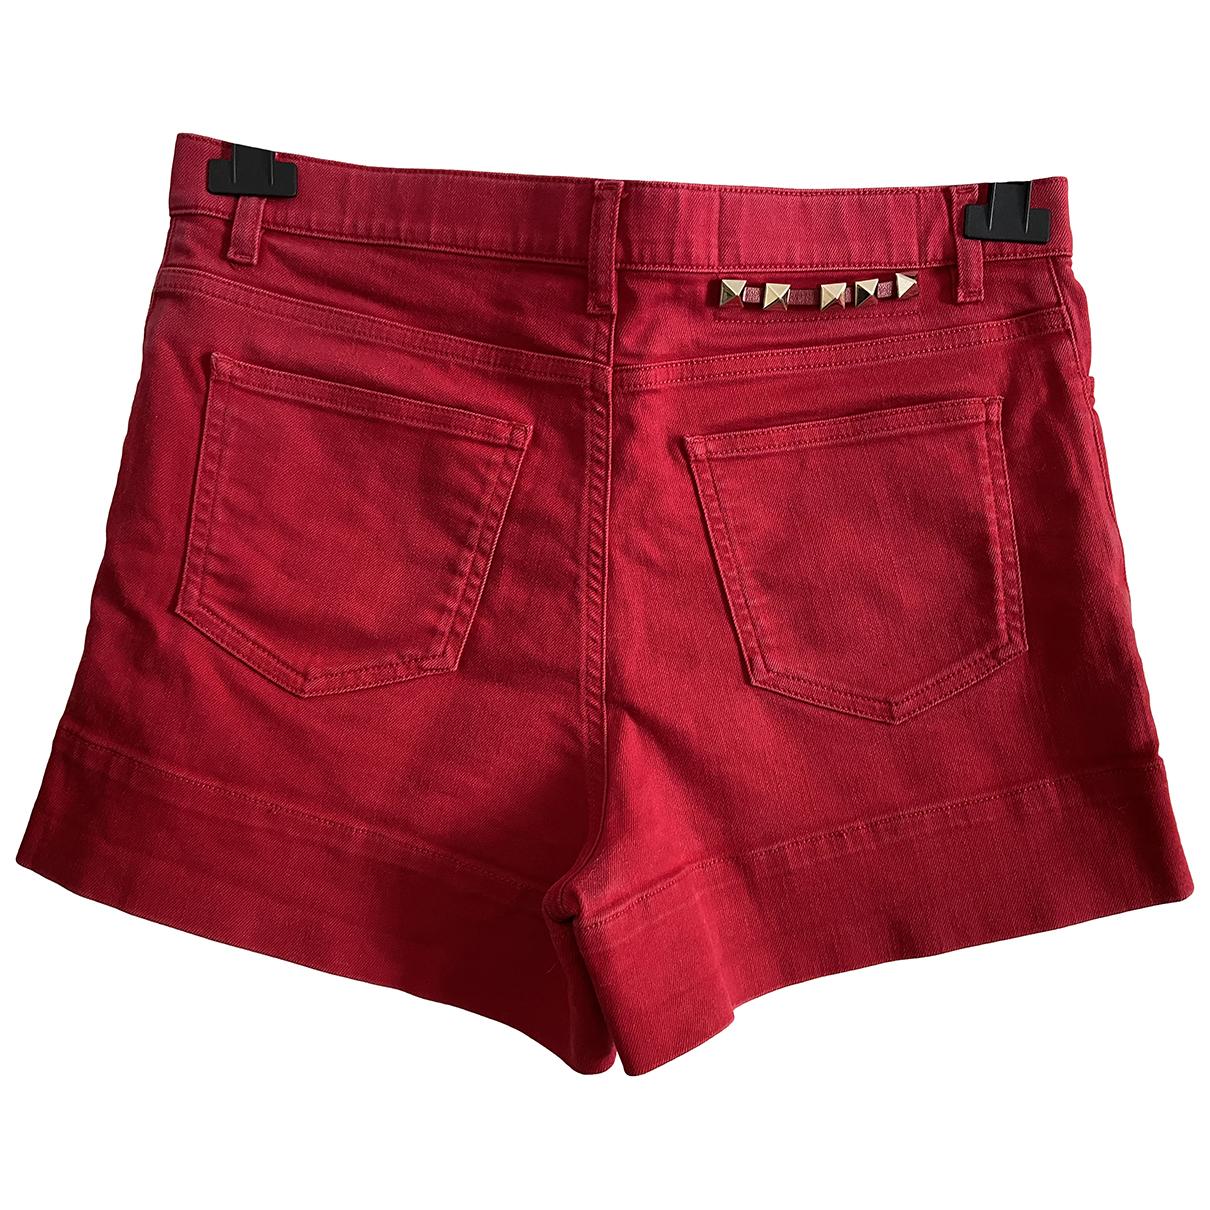 Valentino Garavani \N Red Denim - Jeans Shorts for Women S International